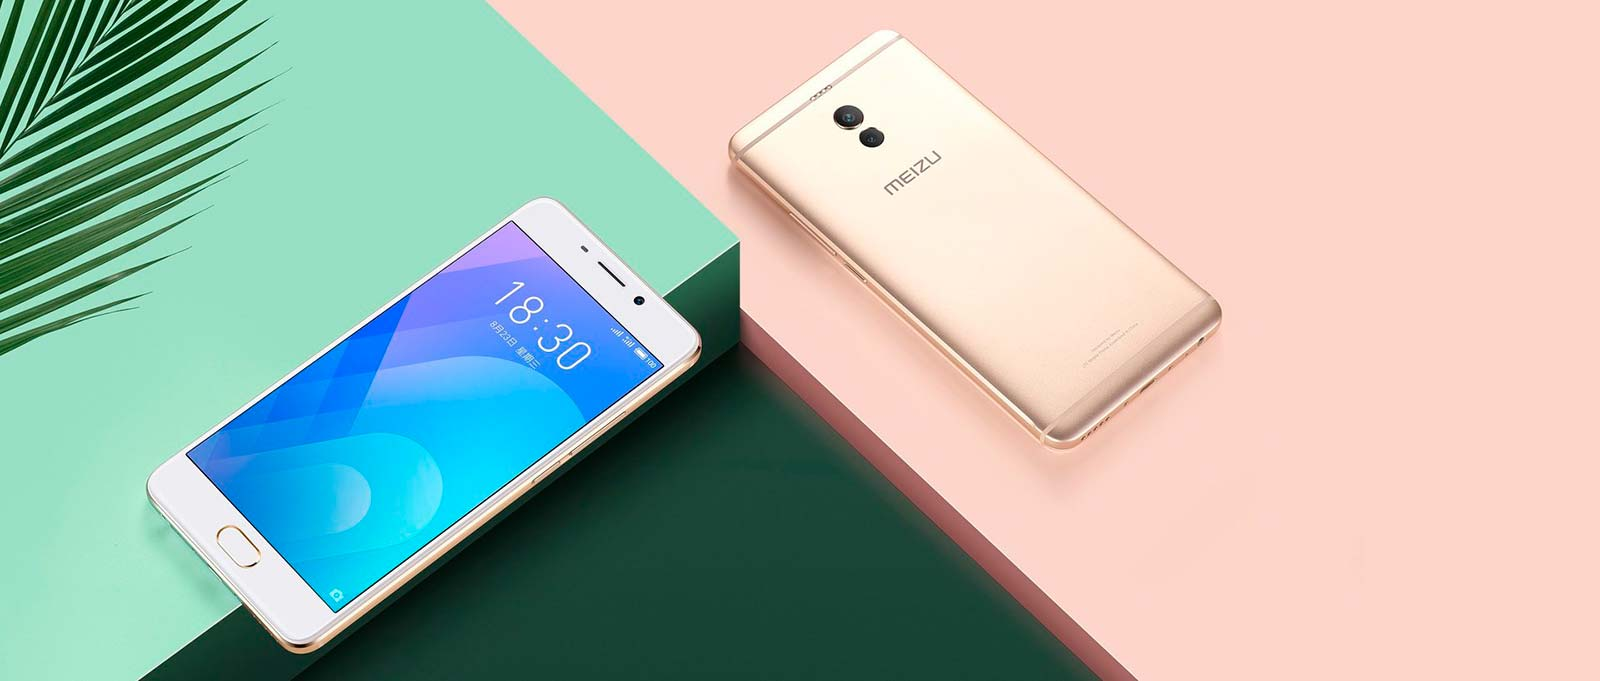 Обзор Meizu M6 - смартфоны Meizu